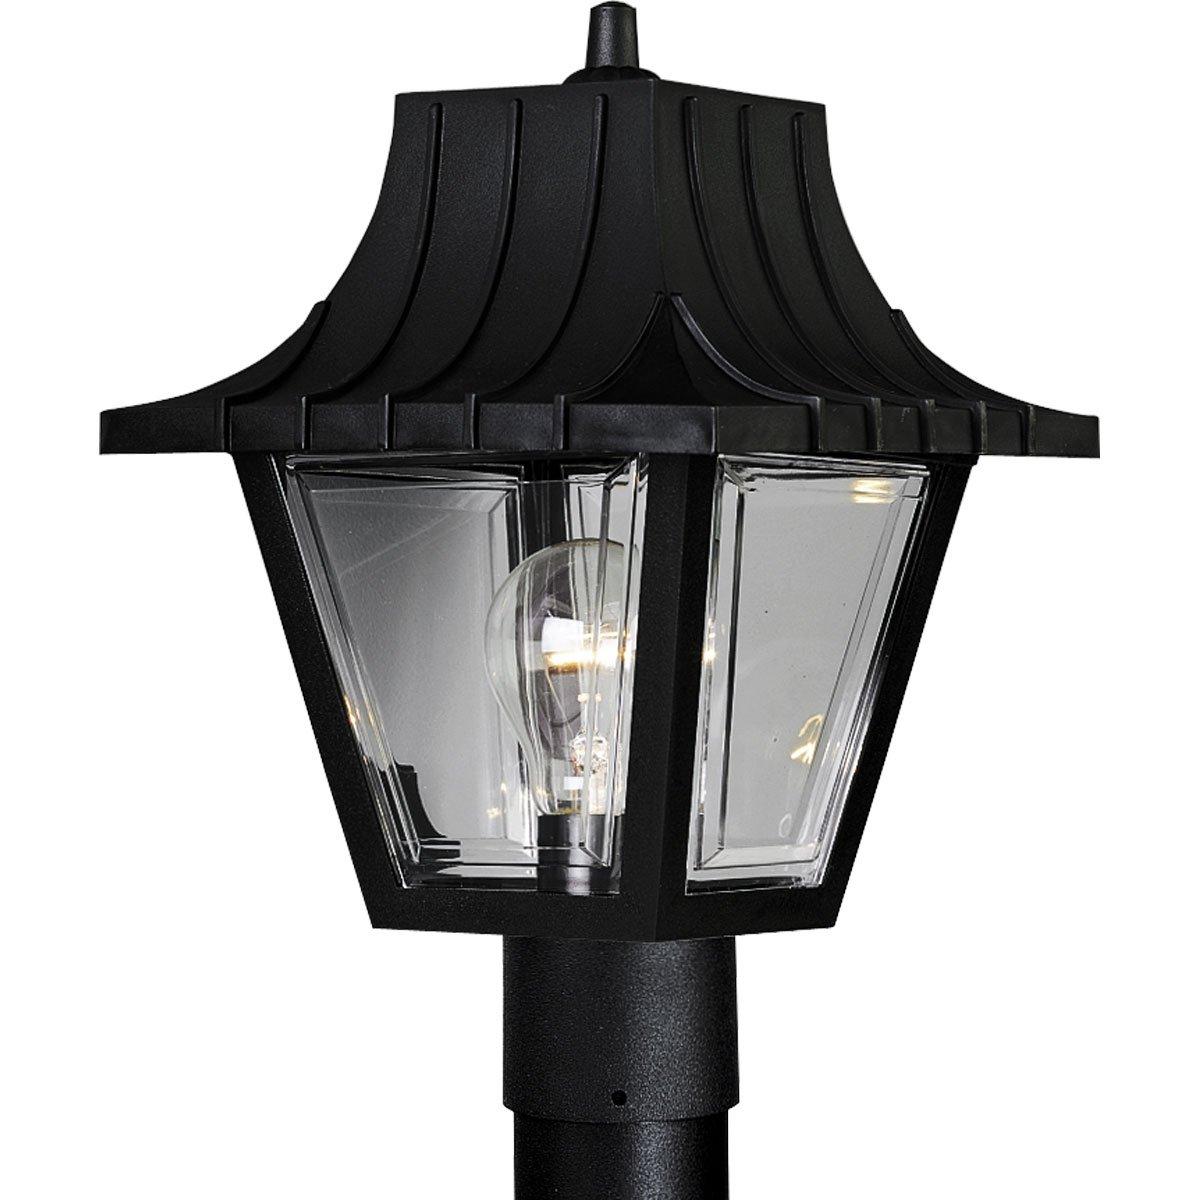 Progress Lighting P5414-31 Post Lantern with Ribbed Mansard Roof Beveled Clear Acrylic Panels, Textured Black by Progress Lighting